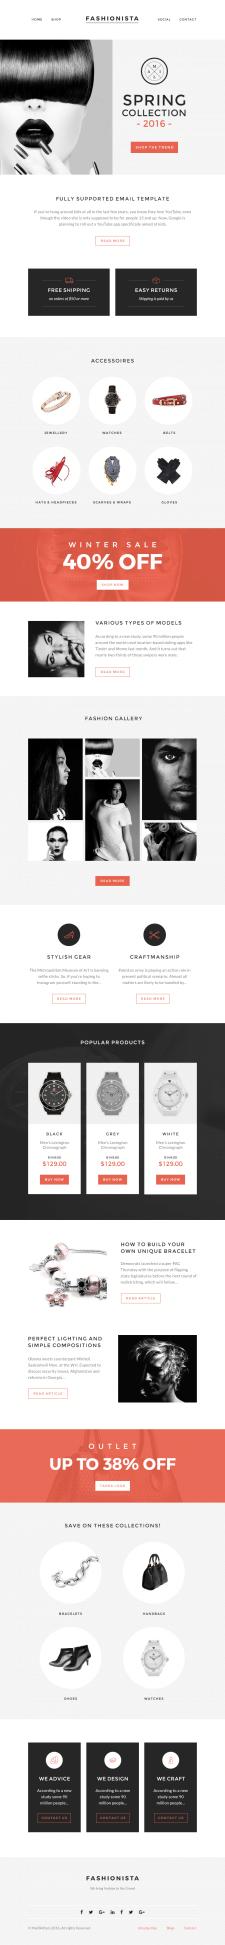 Fashionista - Веб сайт